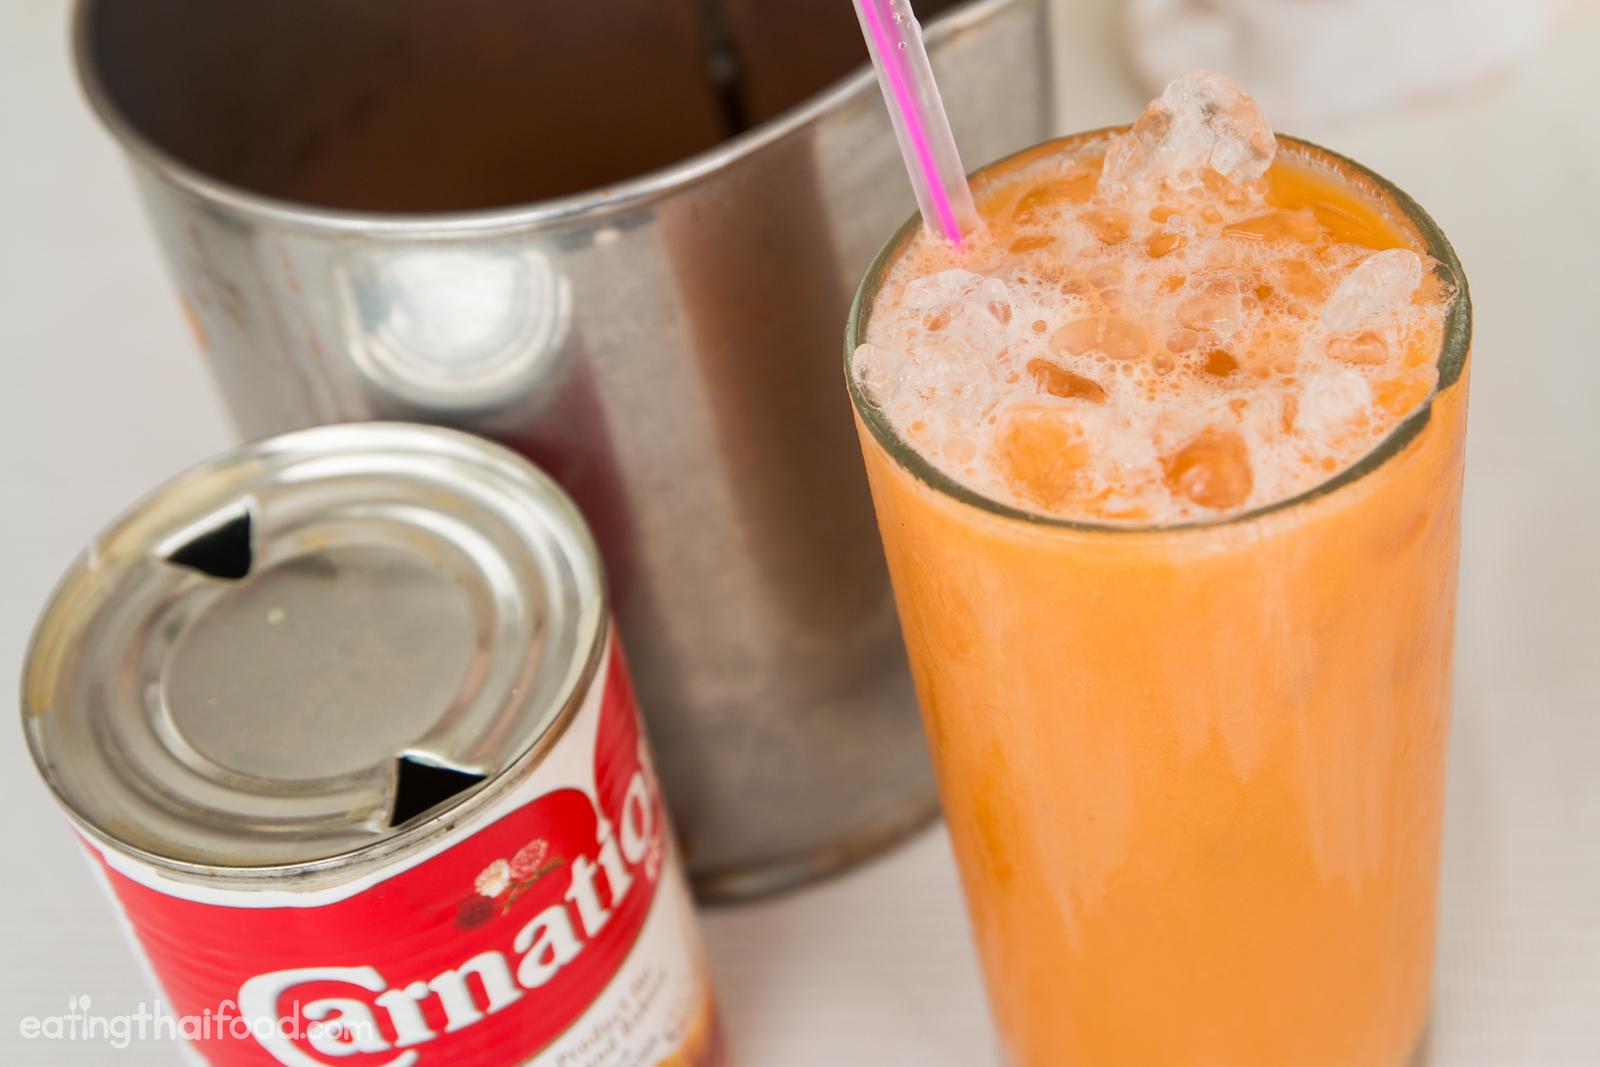 How to make thai tea with condensed milk